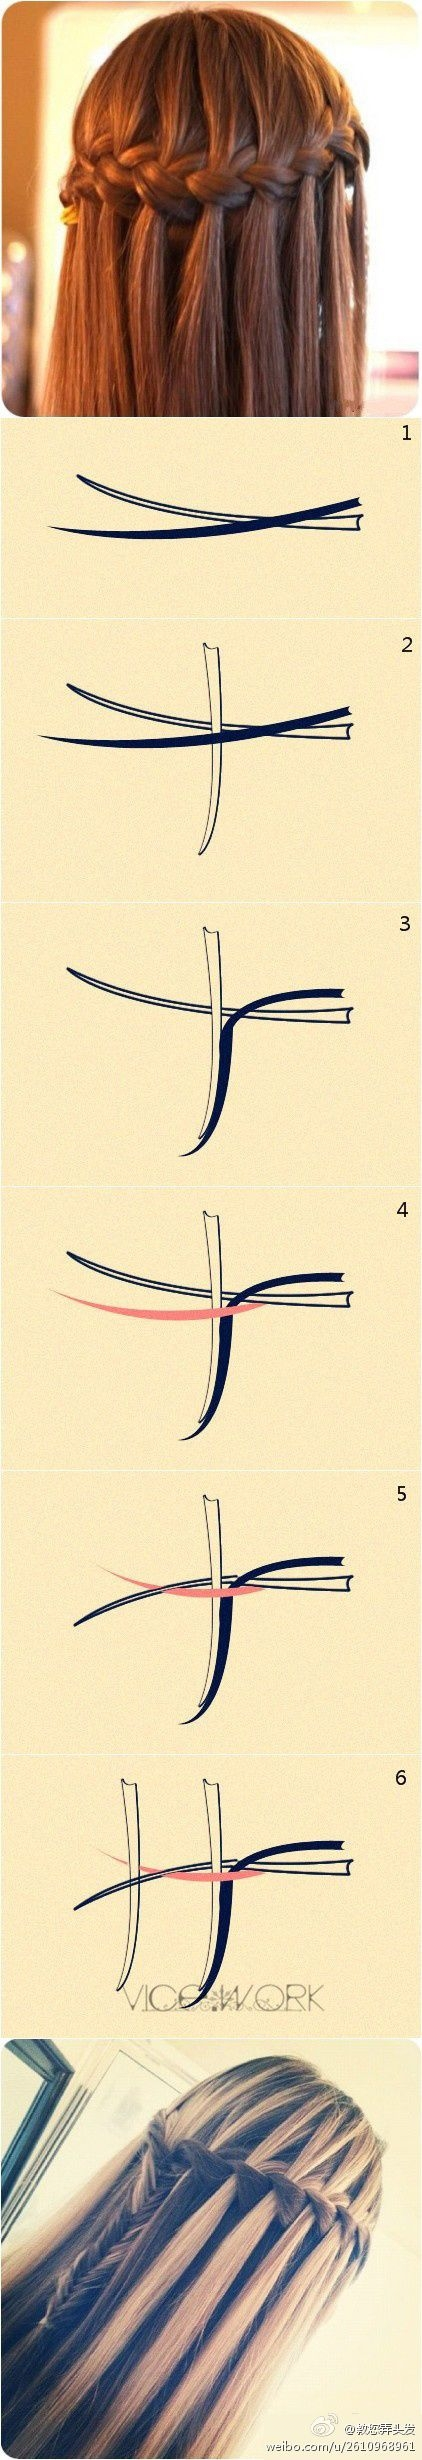 Pletenje pletenica